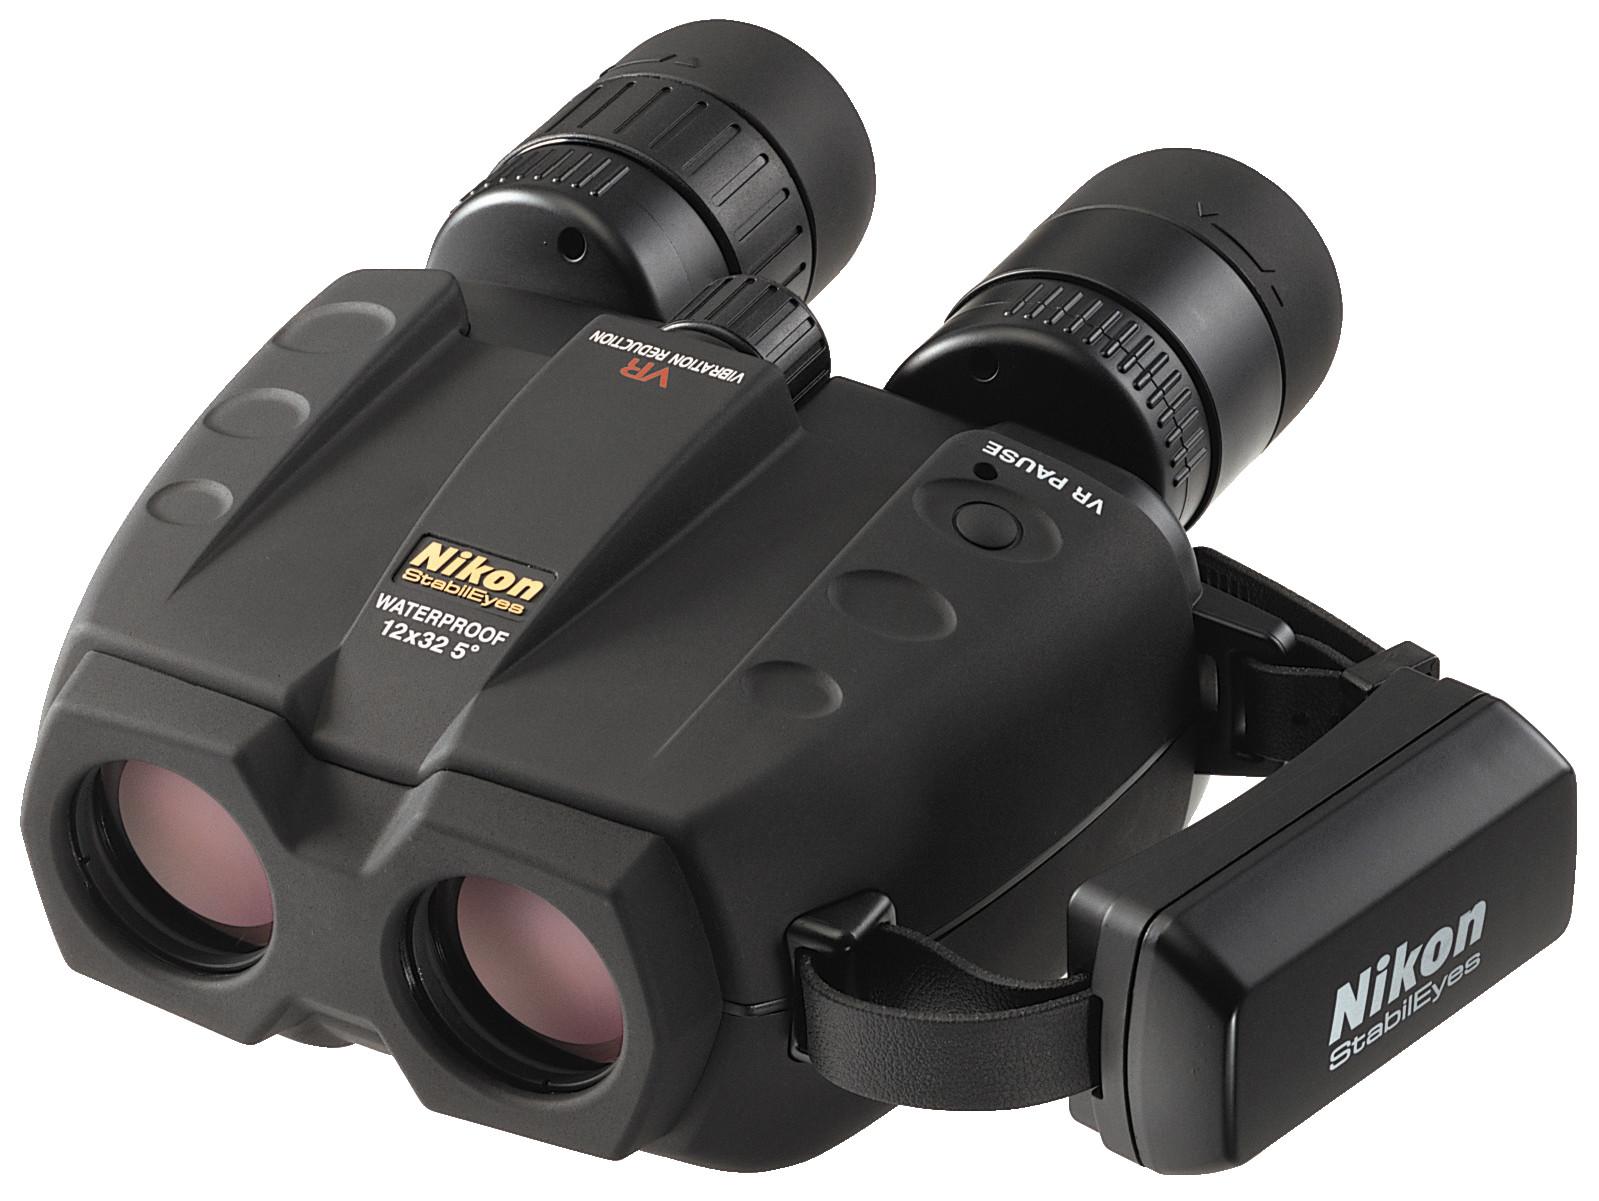 StabilEyes 12X32 避震型望遠鏡 雙筒望遠鏡/單眼鏡-登山賞鳥